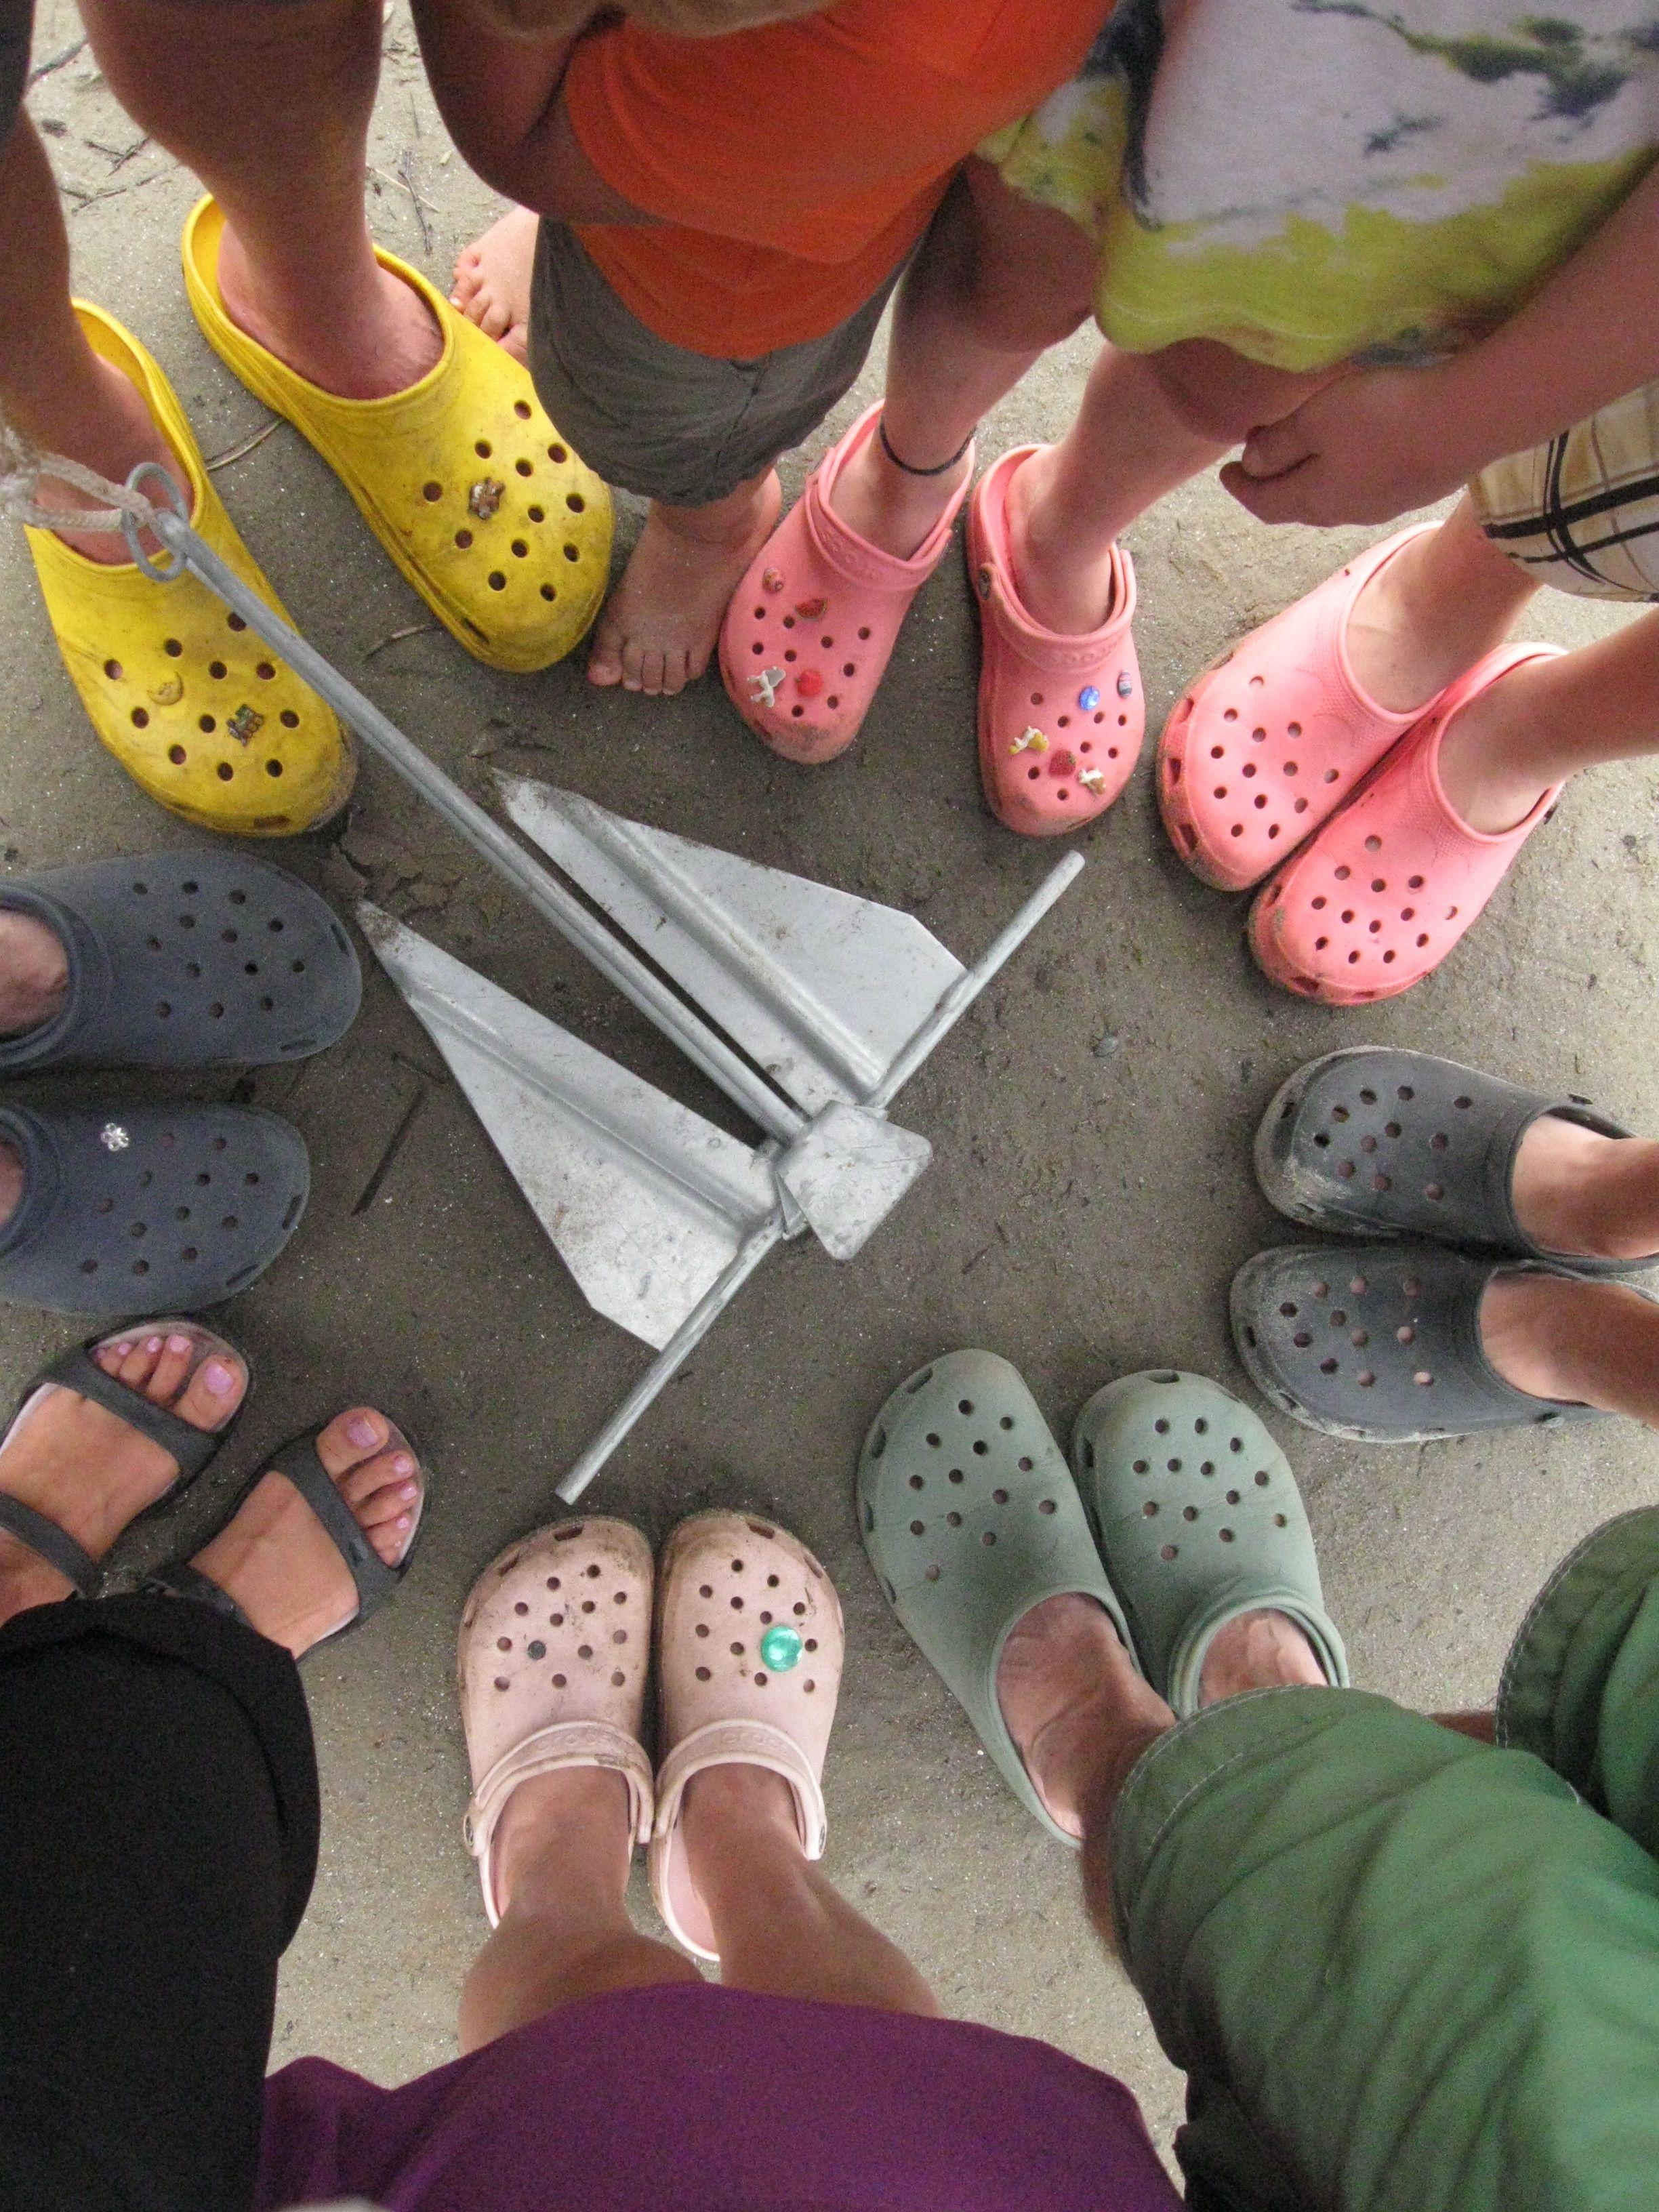 Sure We Wear Crocs Camping Crocs Shoes Crocs Stylish Shoes